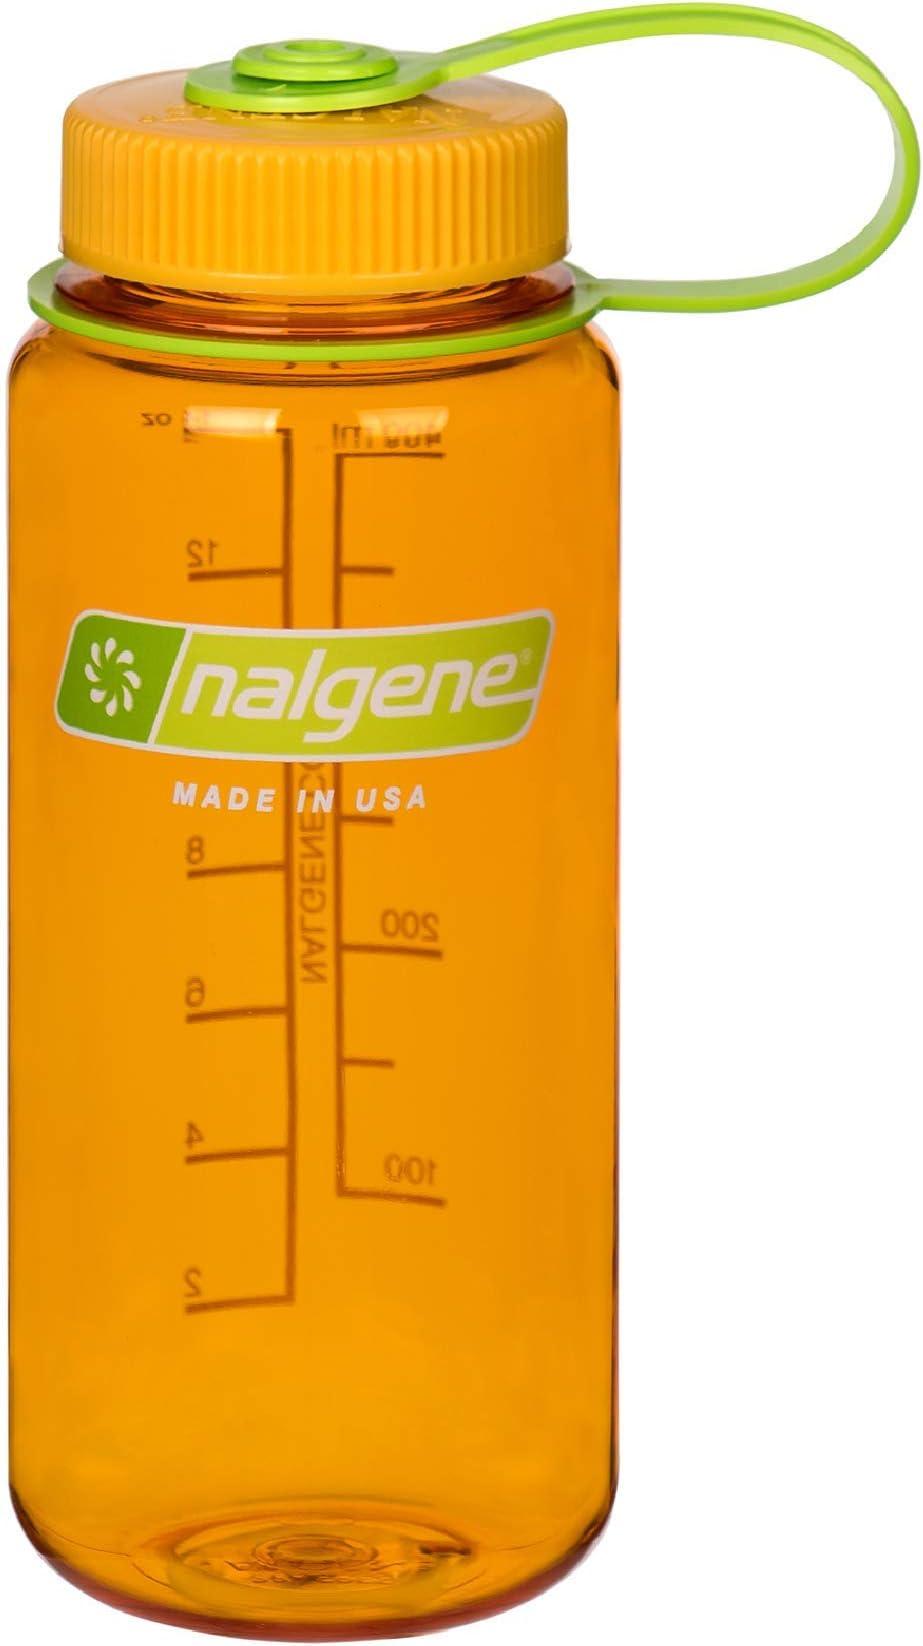 Nalgene Tritan Wide Mouth BPA-Free Water Bottle, Clementine, 16 oz (342071)